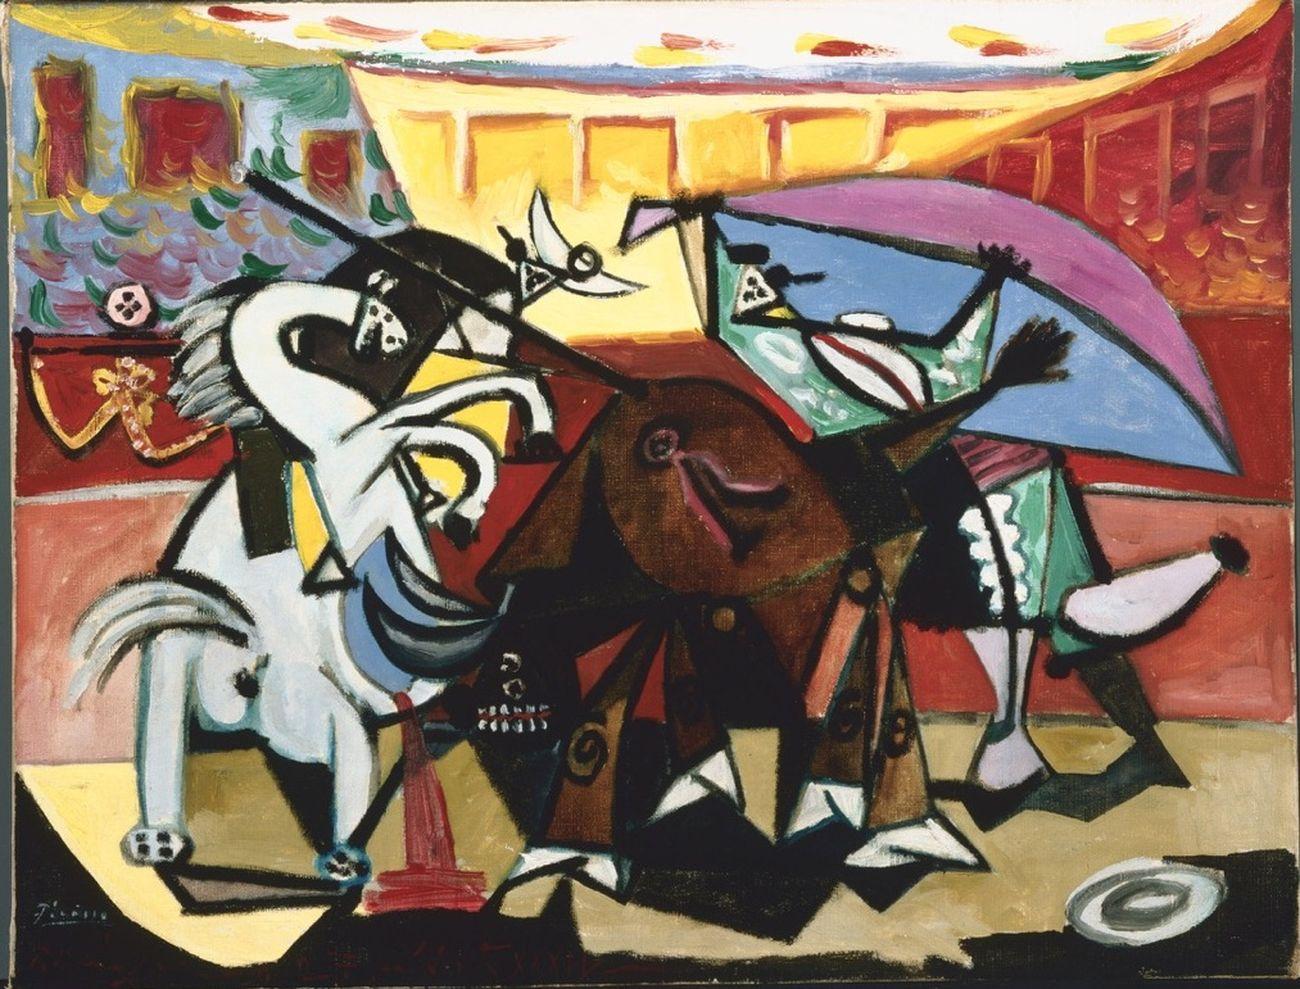 Pablo Picasso, Tauromachia, 1934. Phillips Collection, Washington